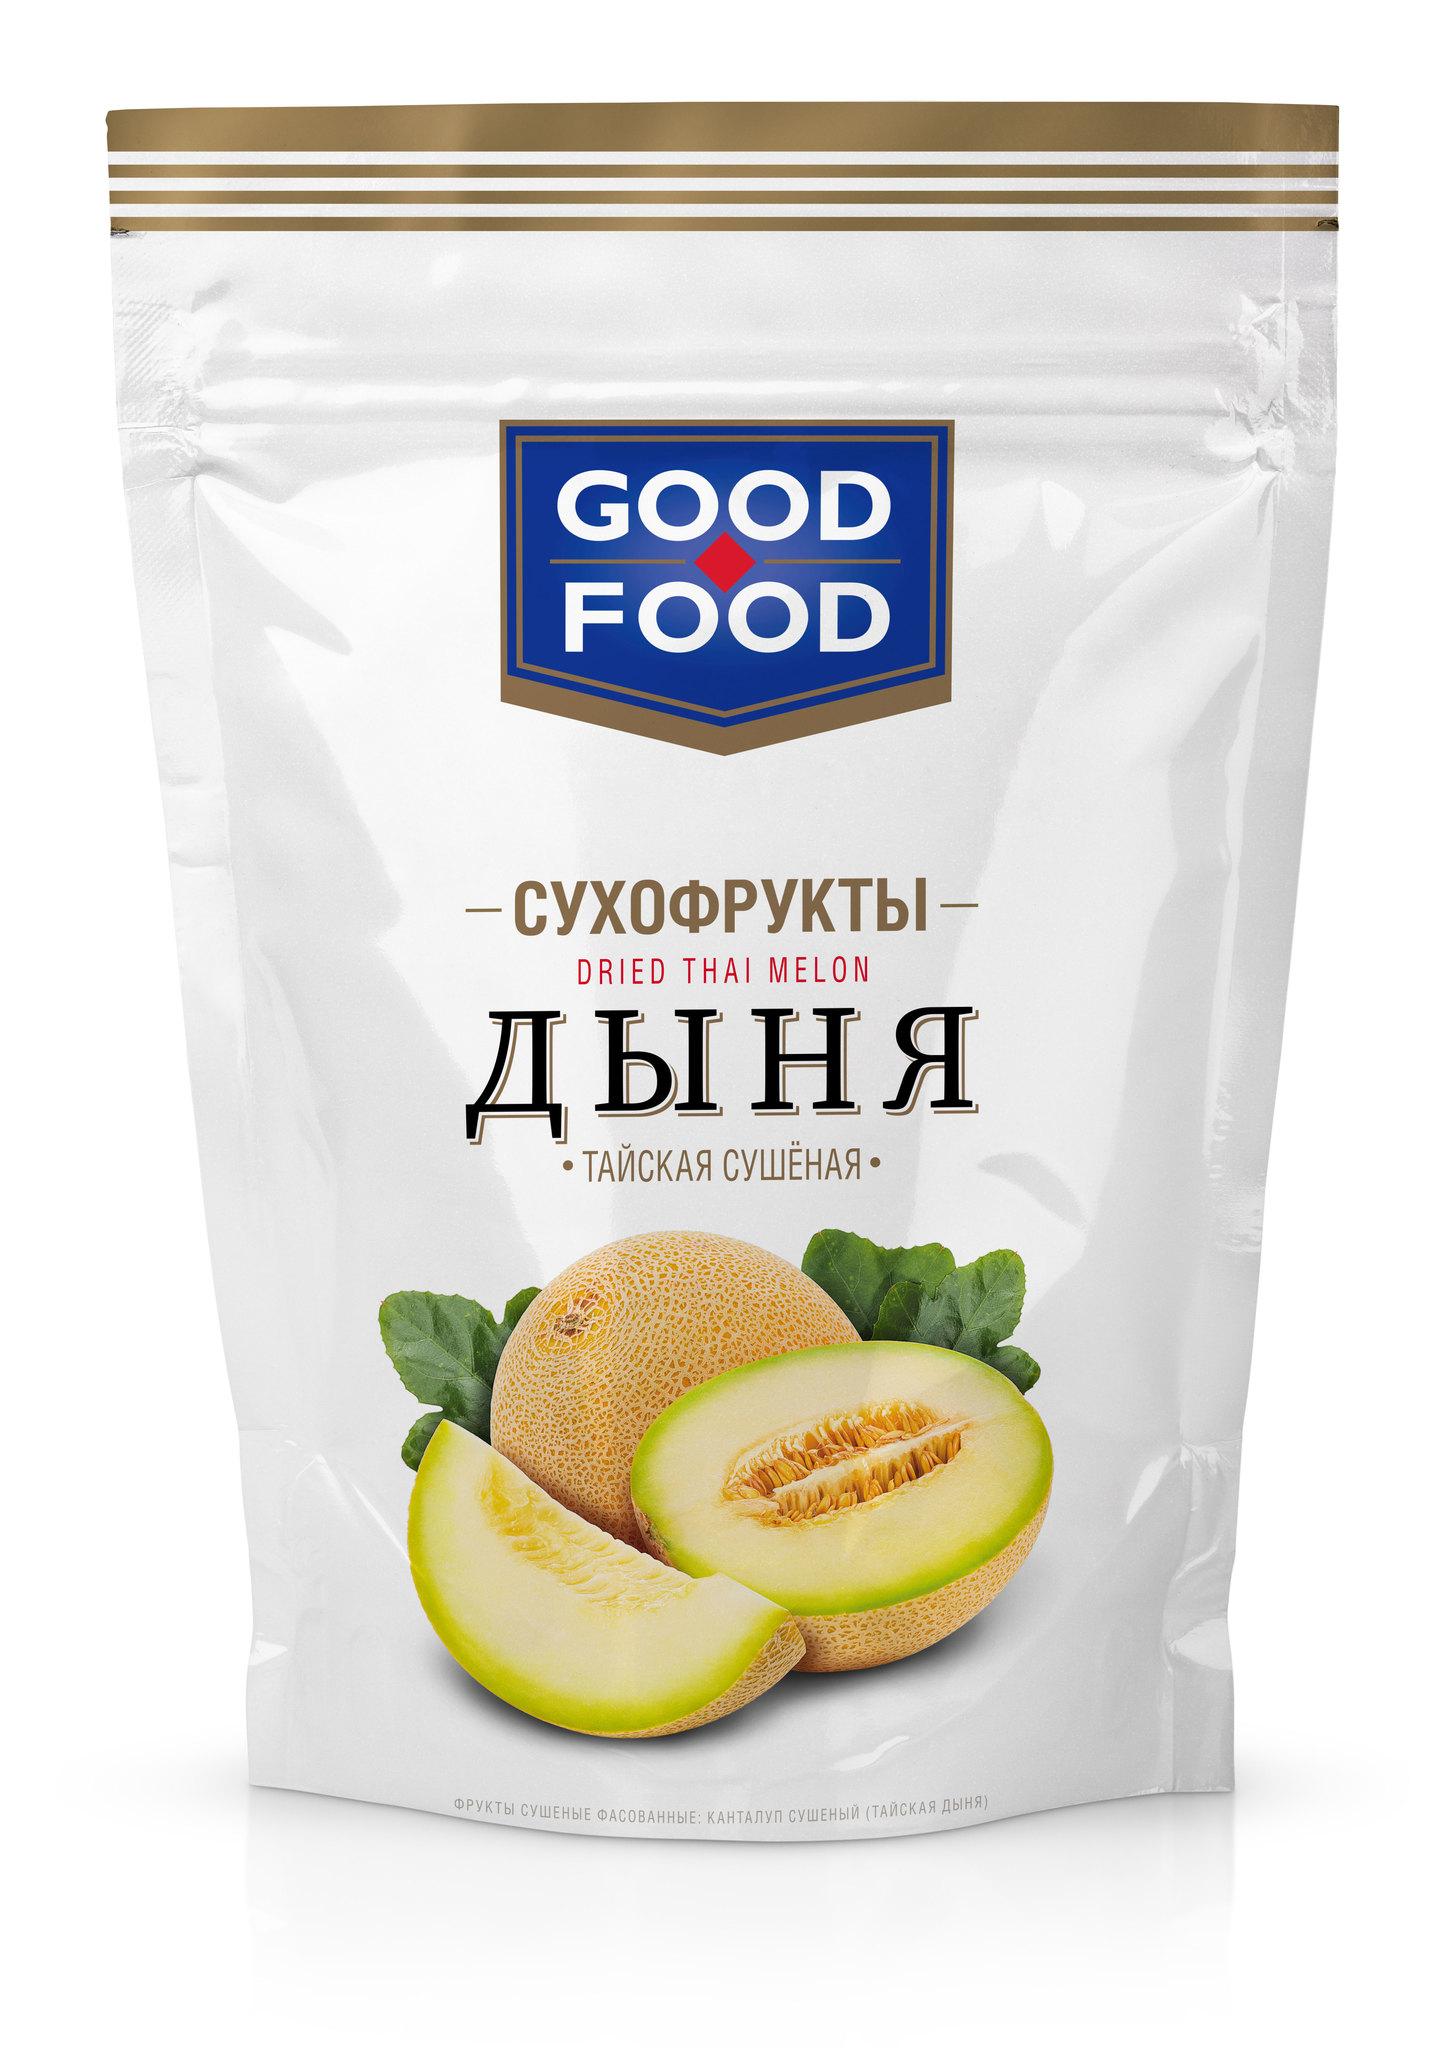 СУХОФРУКТЫ GOOD FOOD ДЫНЯ ТАЙСКАЯ 110ГР